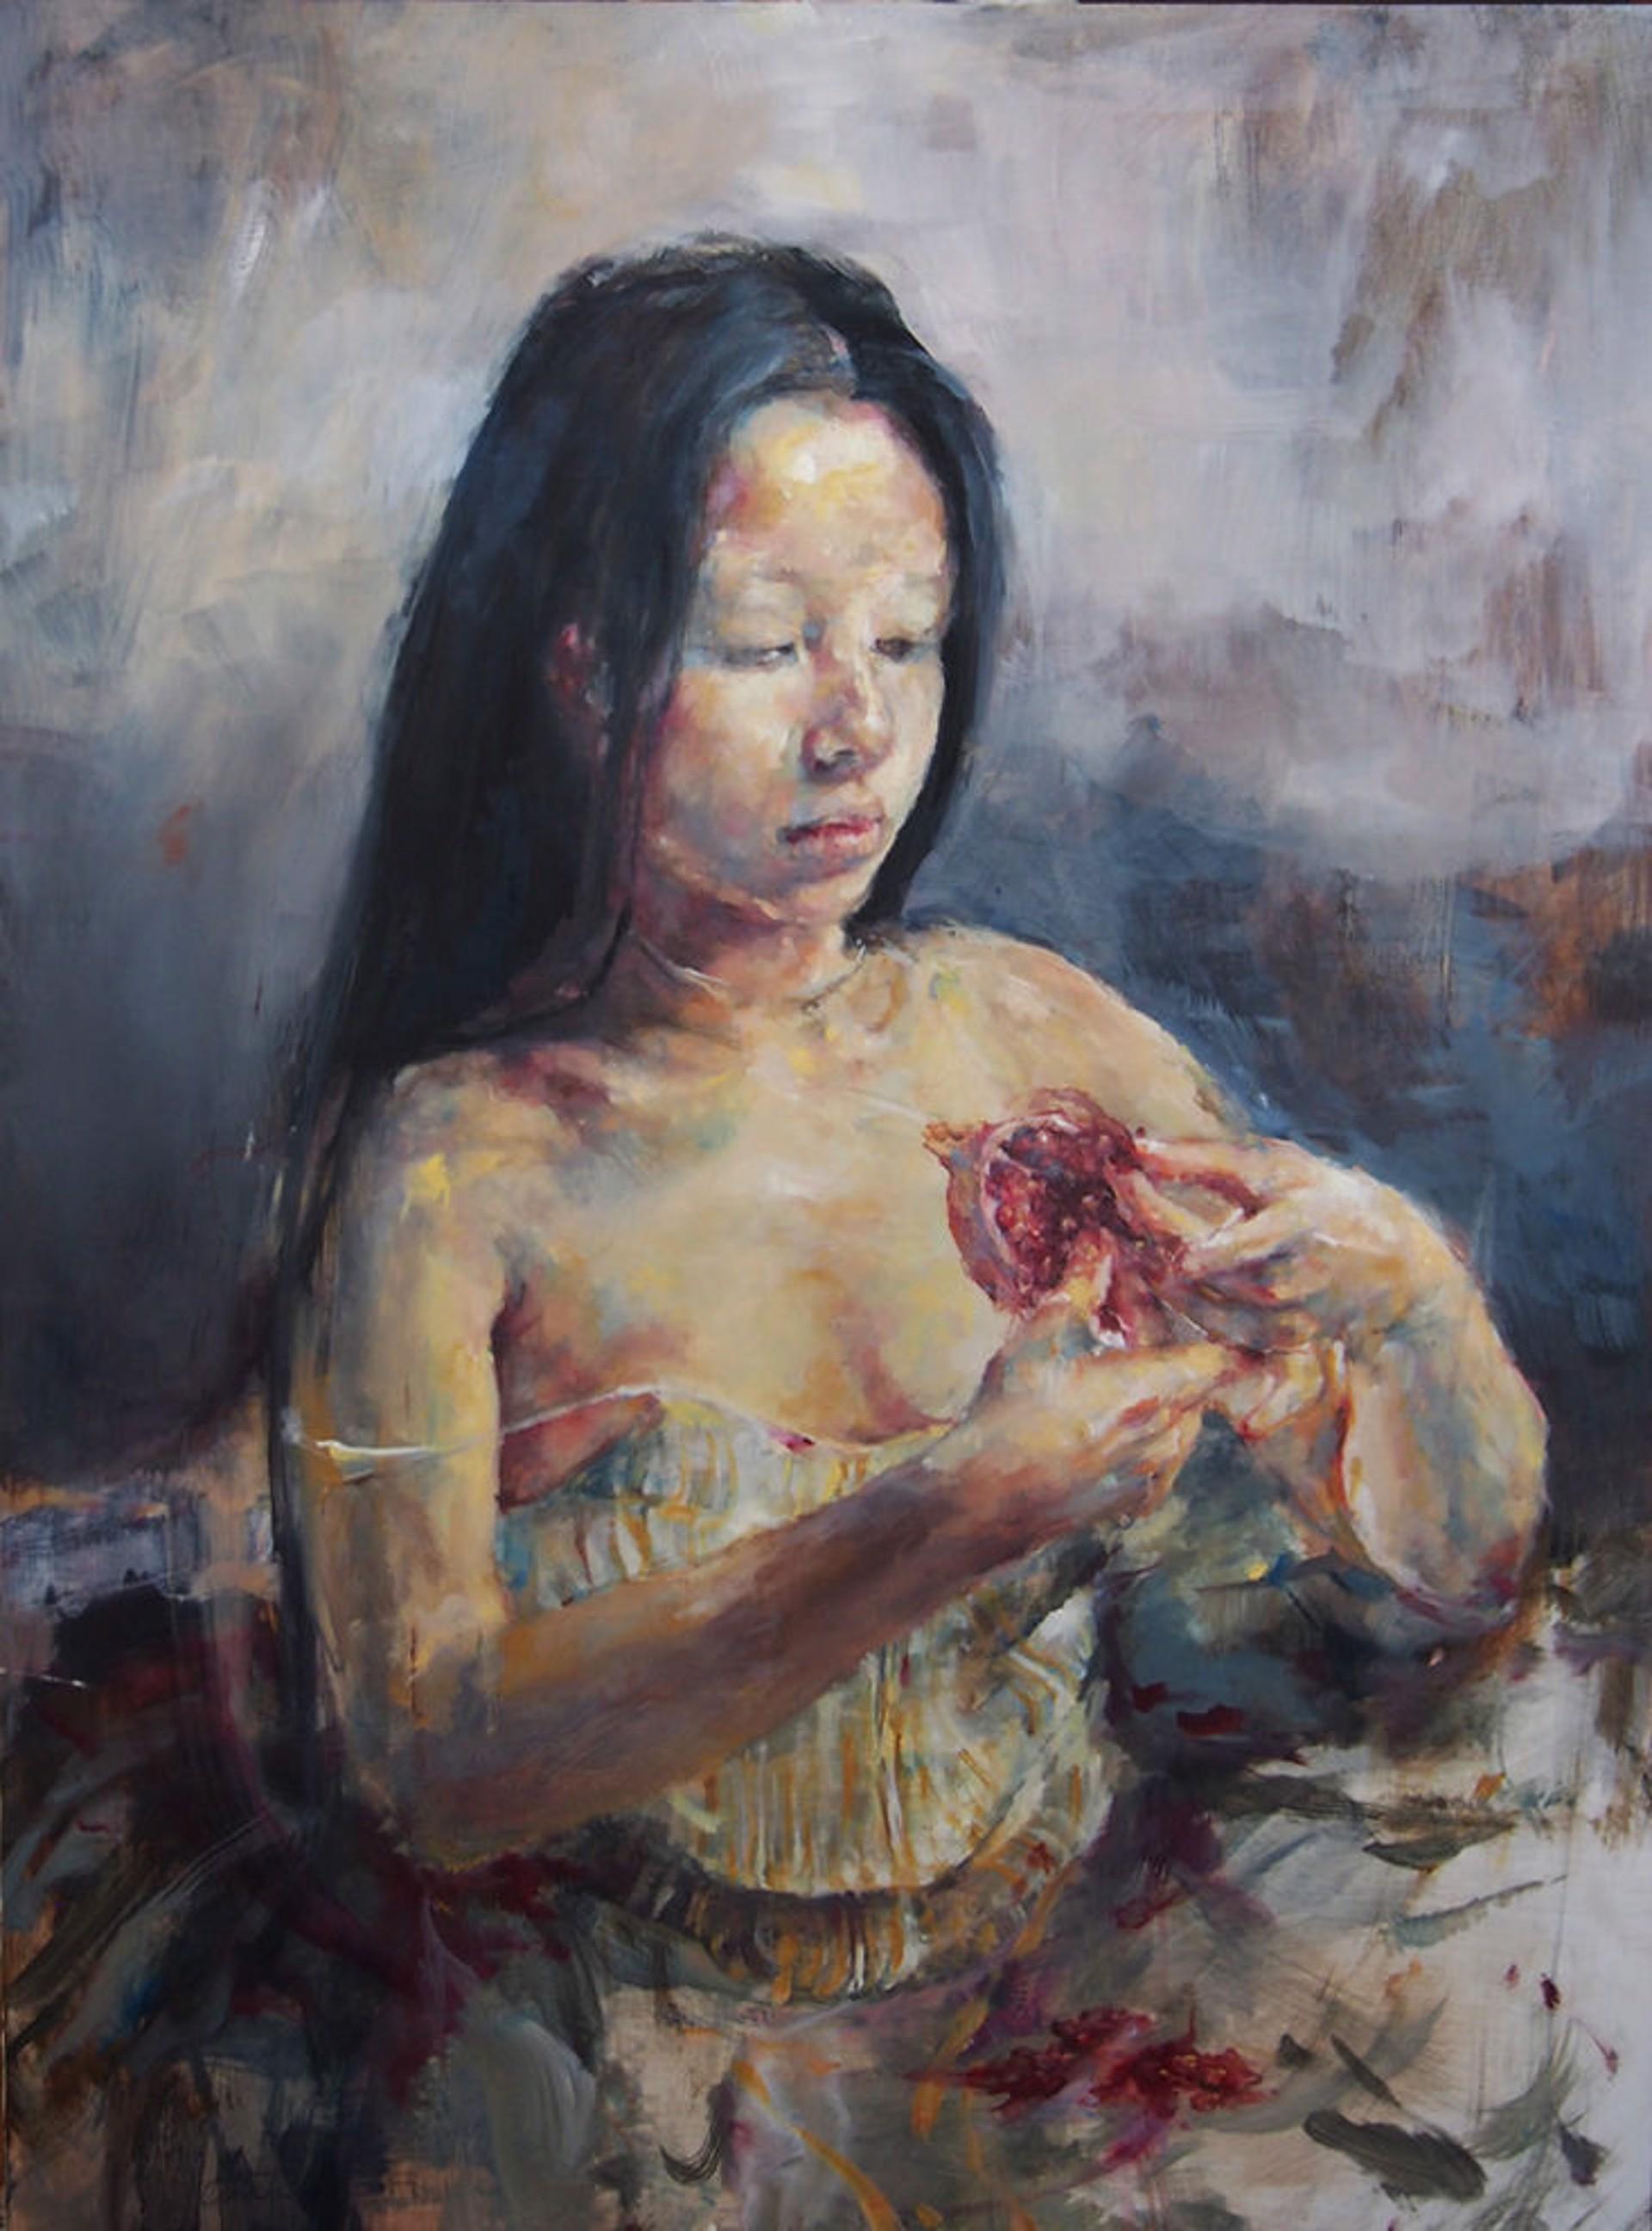 Efflorescence by Jaclyn Alderete